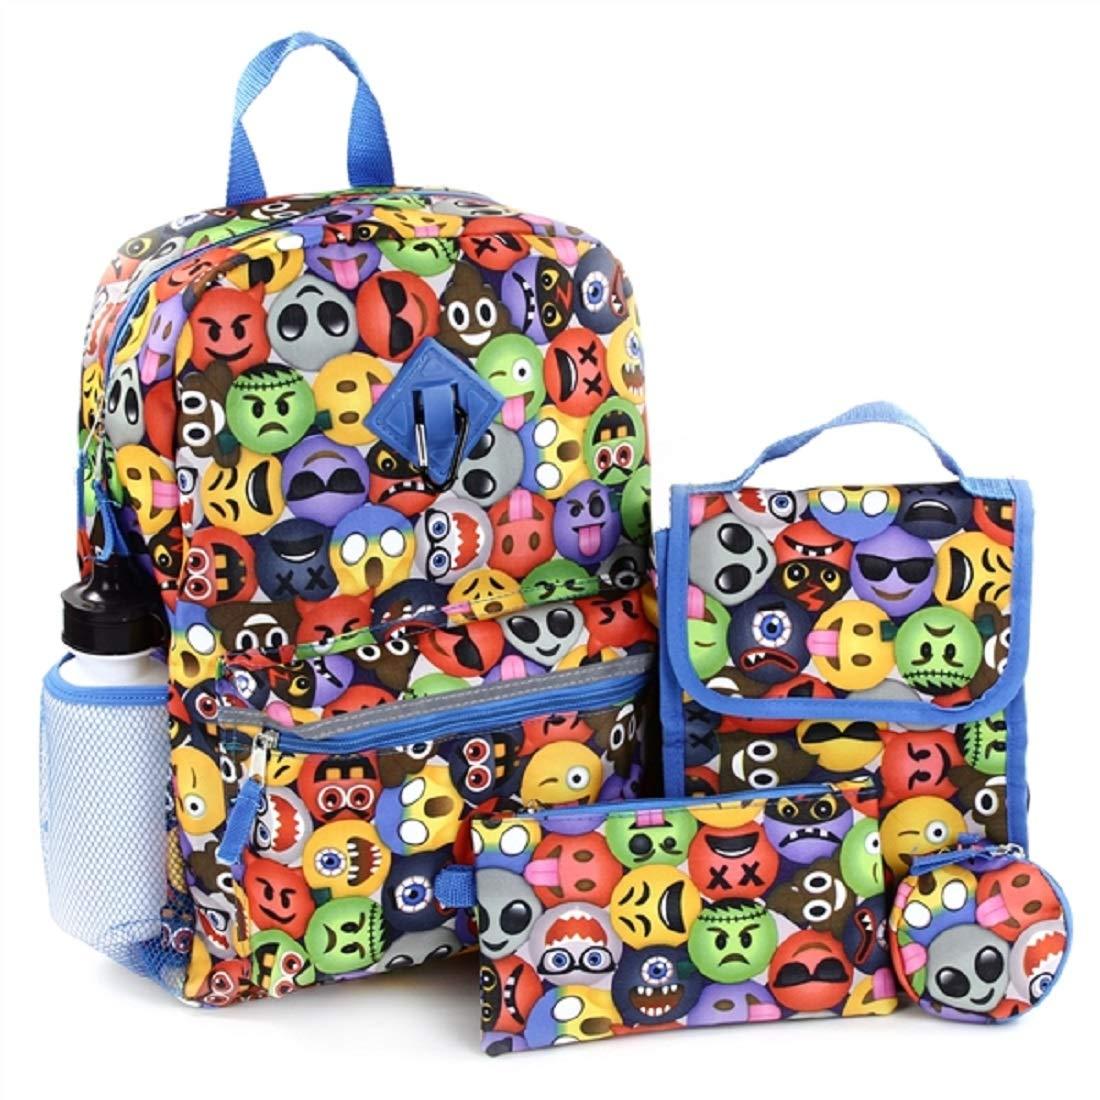 Emoji Design REBOOT 16 6-Piece Backpack Set